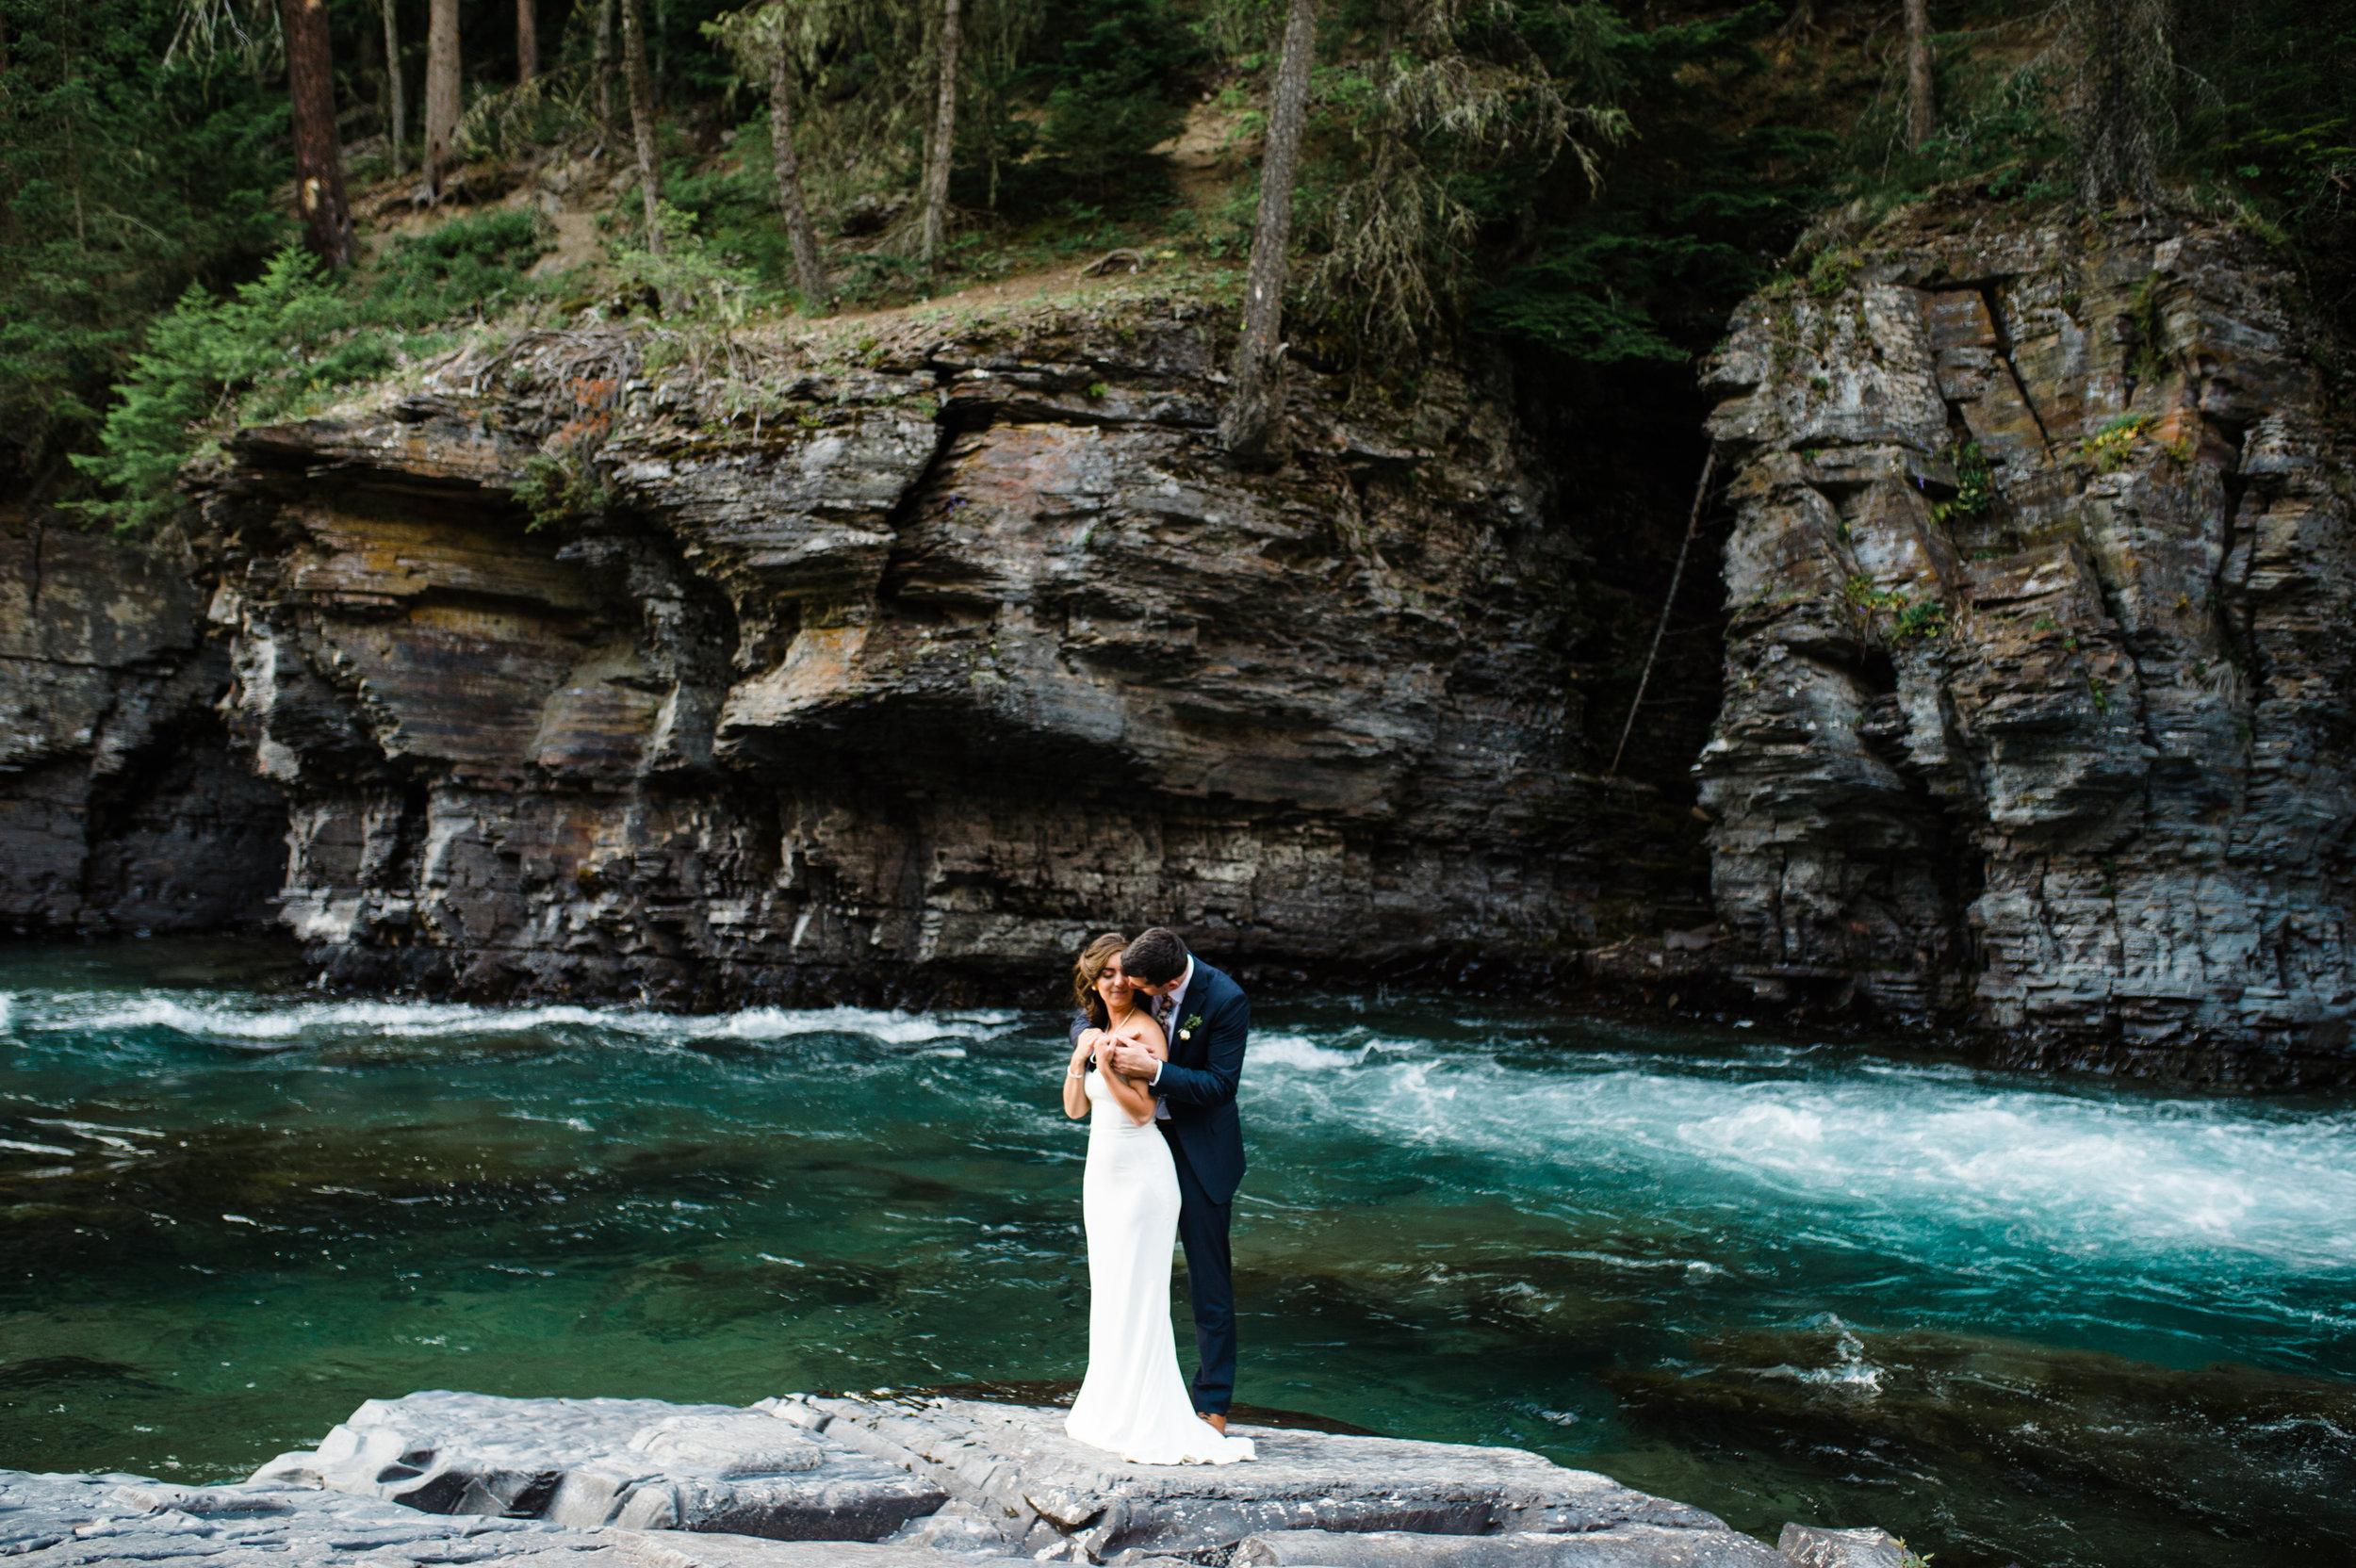 016Glacier National Park Wedding_Glacier Outdoor Center_Honeybee Weddings_Anna & Seth_July 21, 2019-2508.jpg